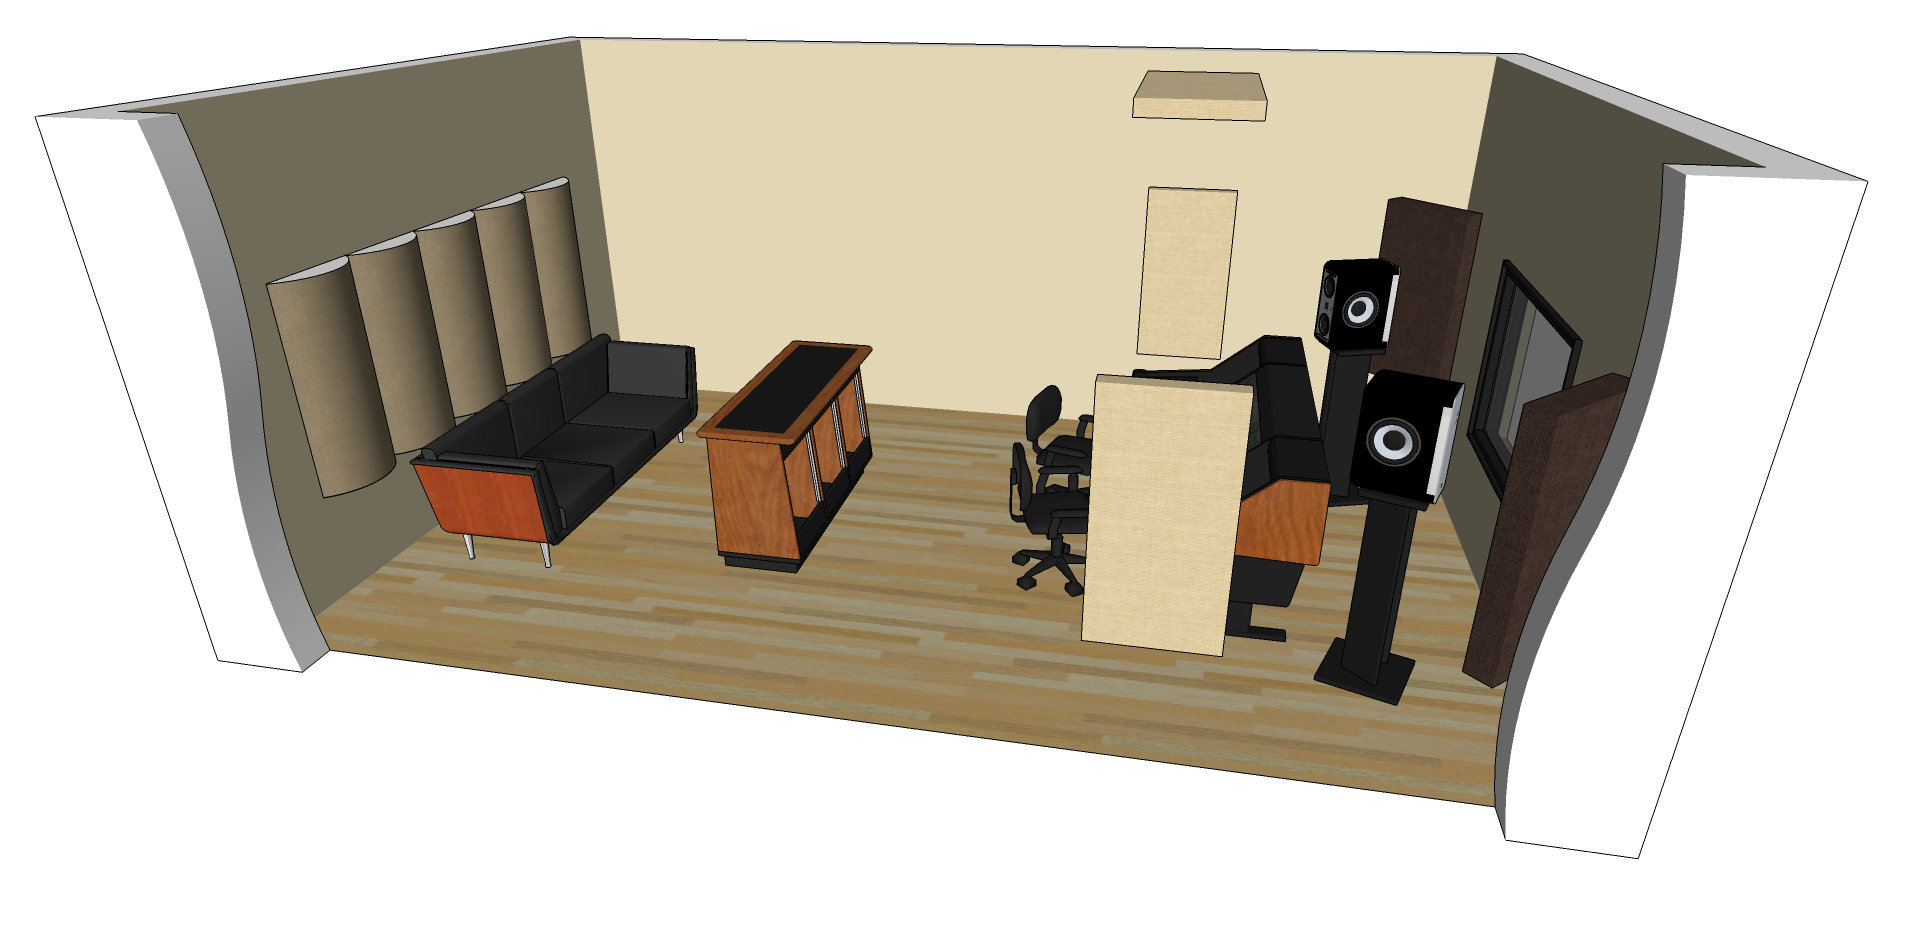 diffusion studio acoustics bass trap